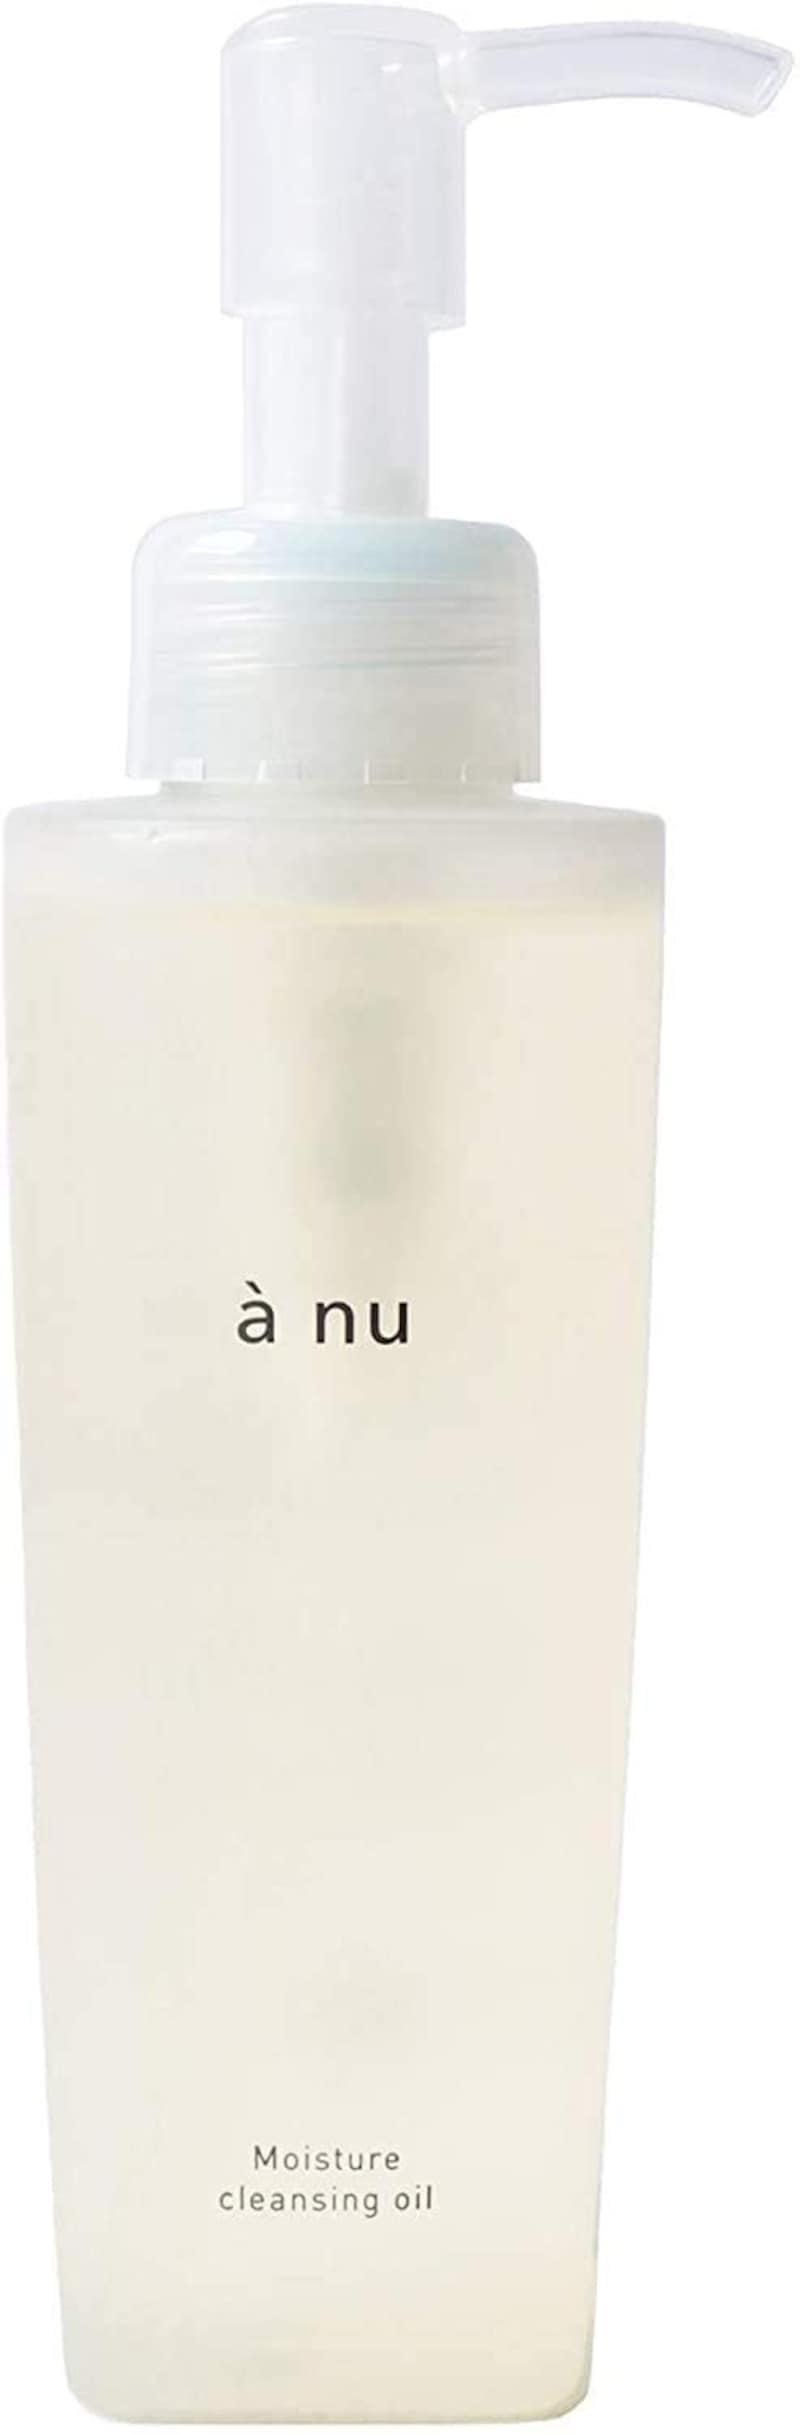 à nu(アニュ),モイスチャークレンジングオイル